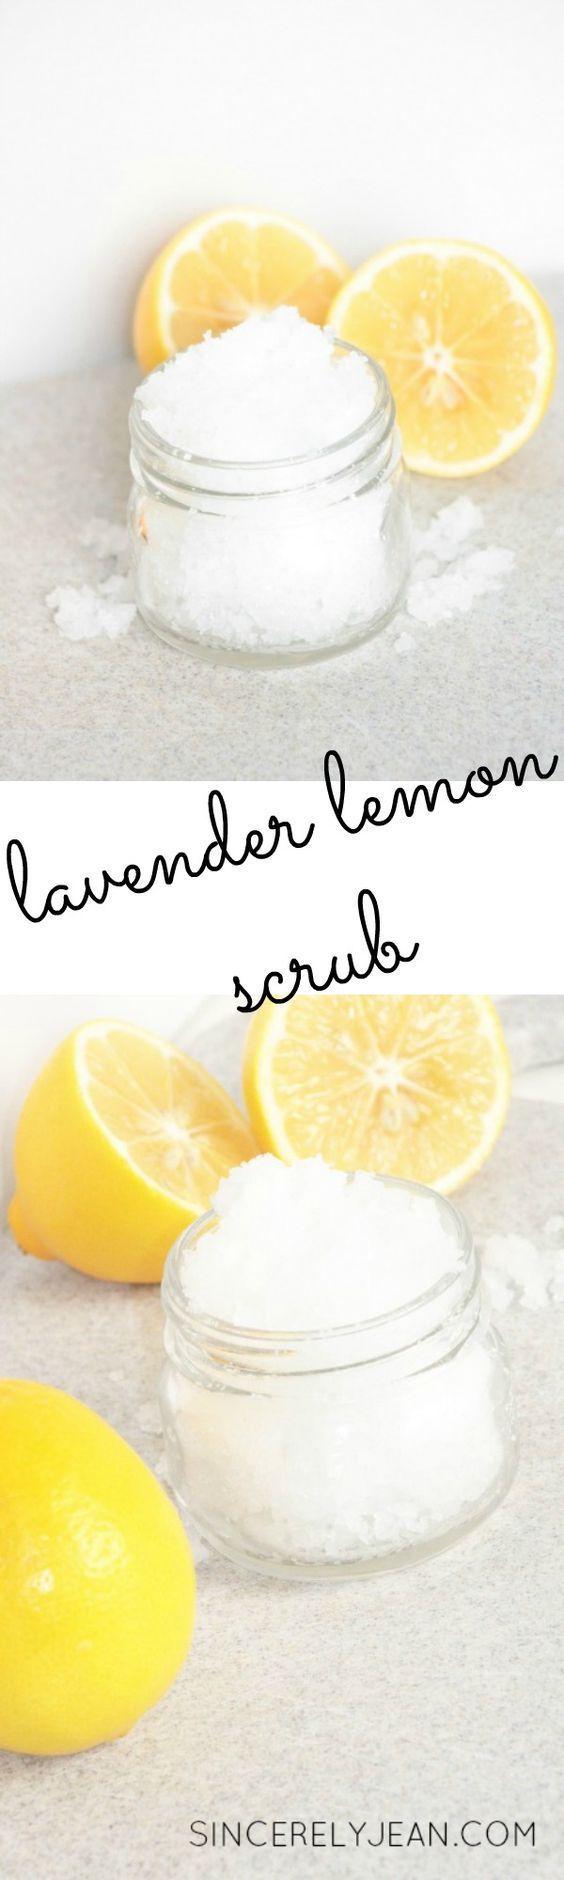 Lavender Lemon Salt Scrub - Step by step tutorial on how to make your own salt scrub | http://www.sincerelyjean.com